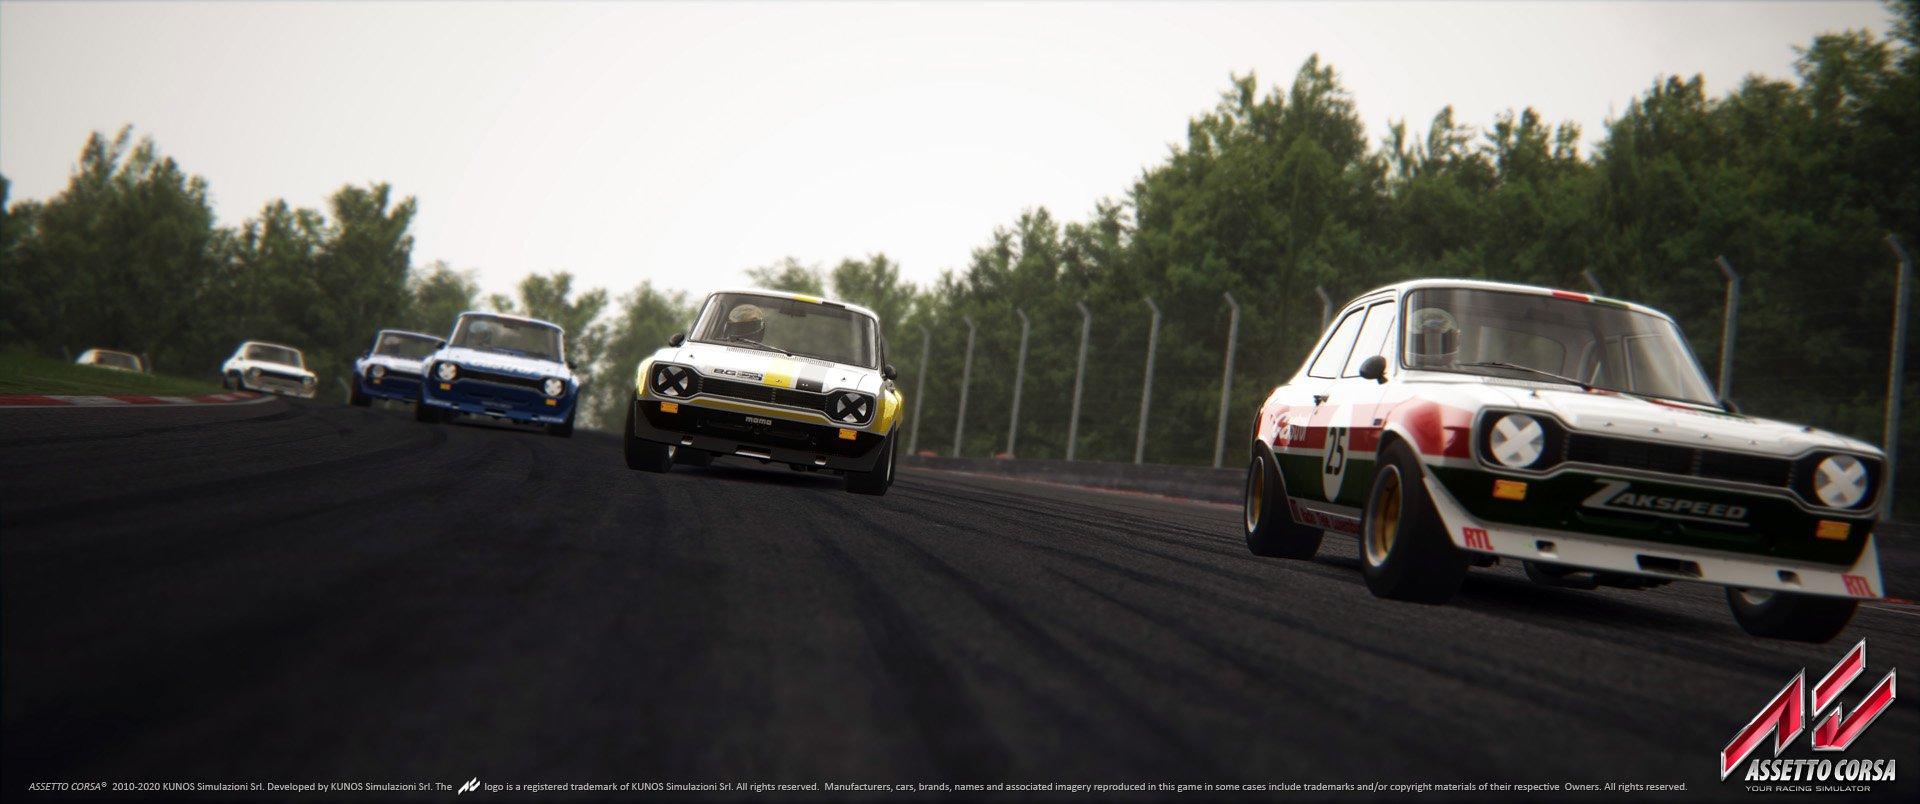 Assetto Corsa Dream Pack 3 13